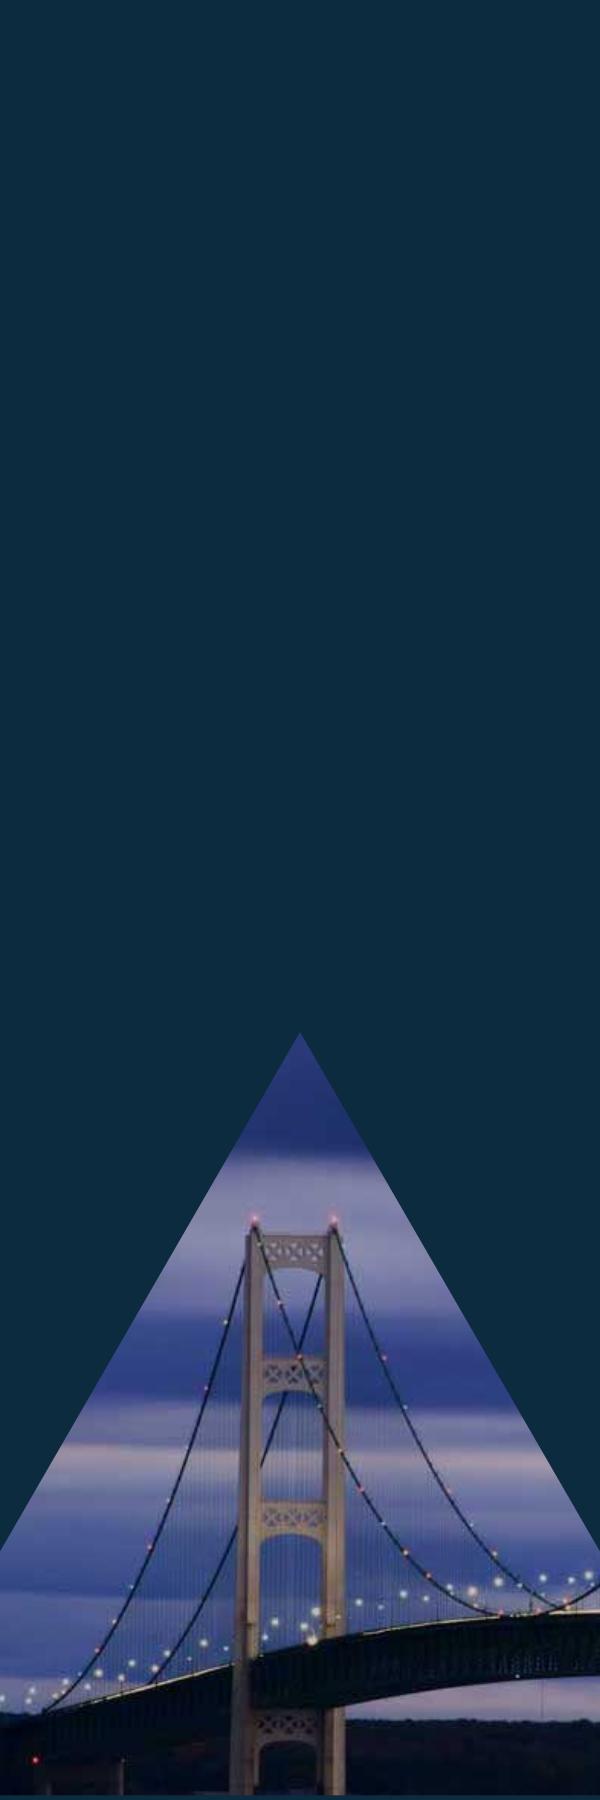 Blue sidebar panel image with bridge